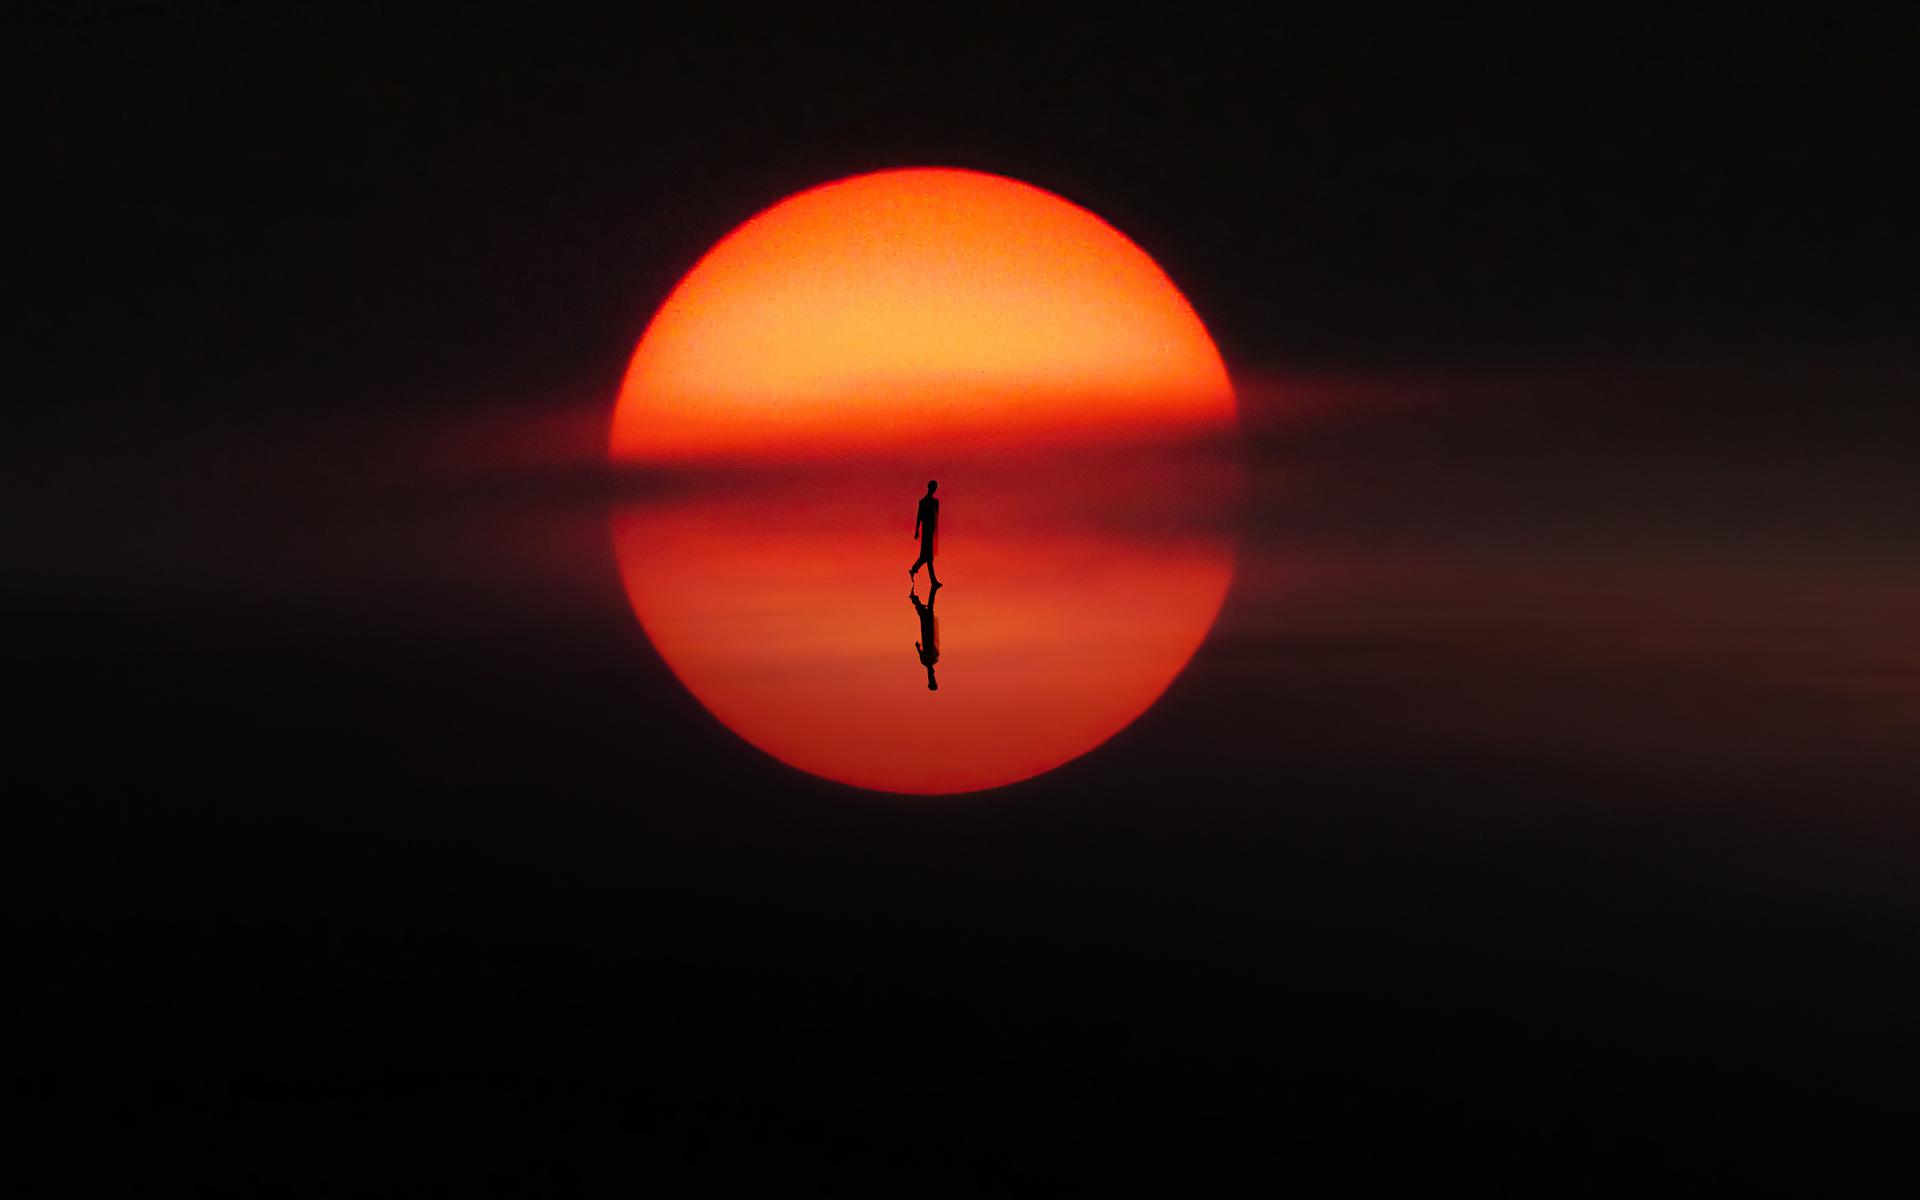 reflection-of-solitude-5a.jpg